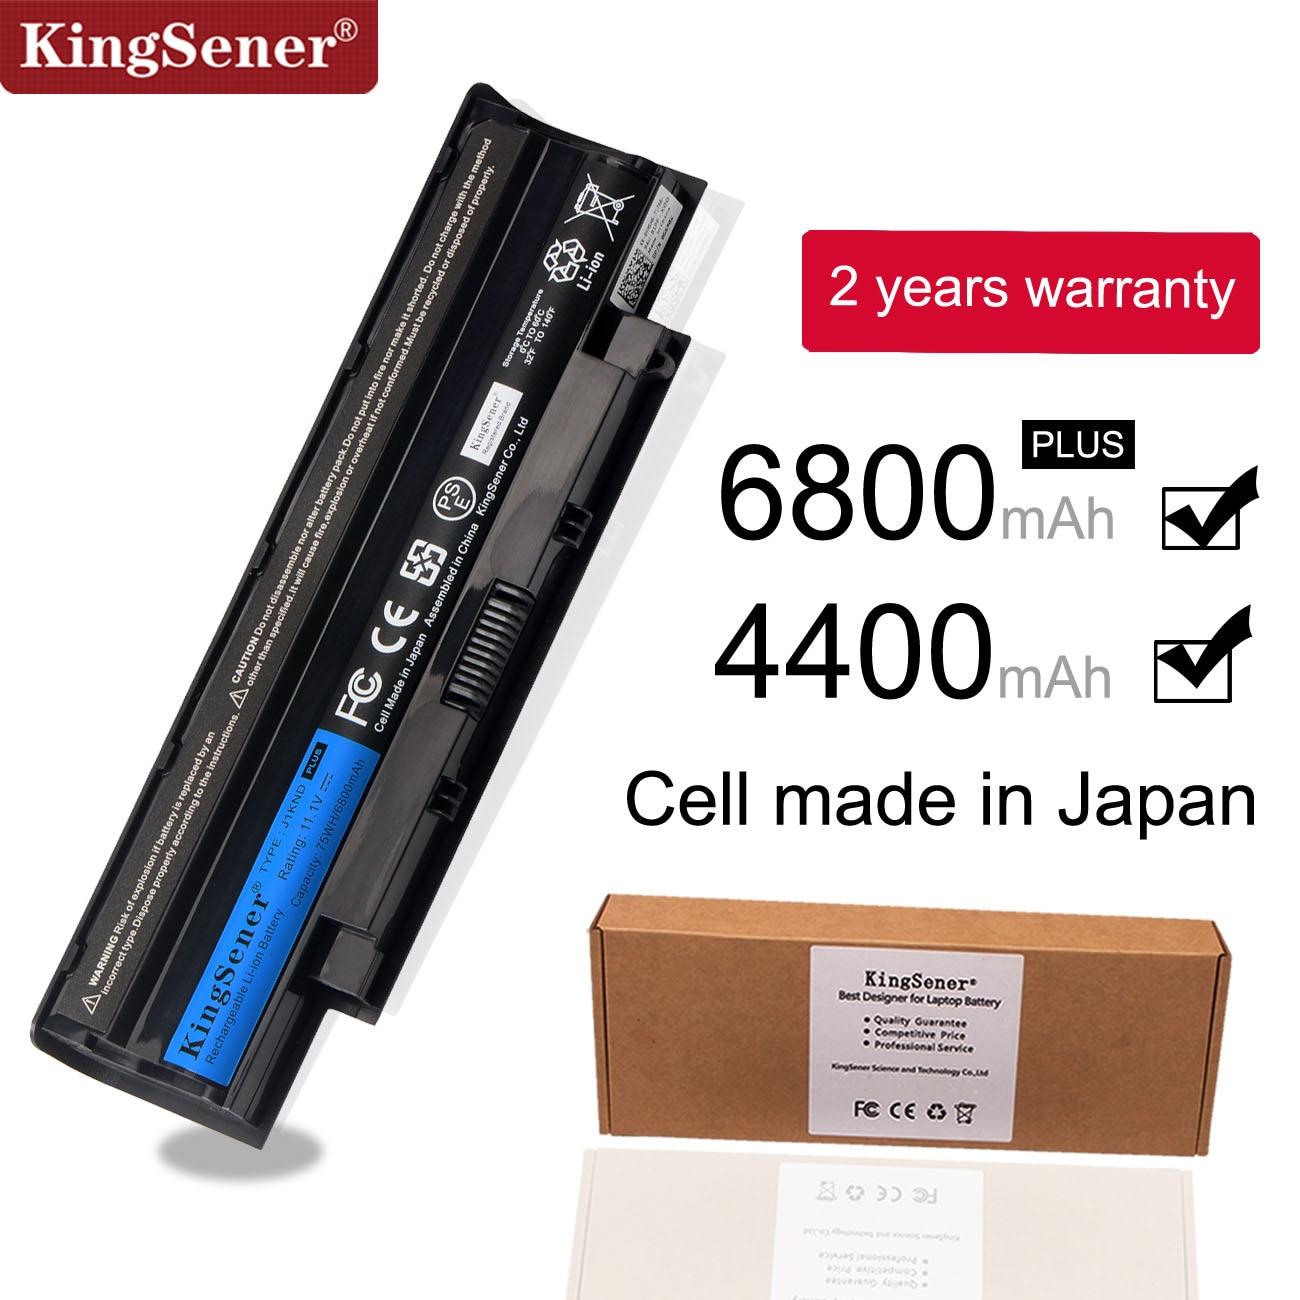 KingSener J1KND Laptop Batterie für DELL Inspiron N4010 N3010 N3110 N4050 N4110 N5010 N5010D N5110 N7010 N7110 M501 M501R M511R